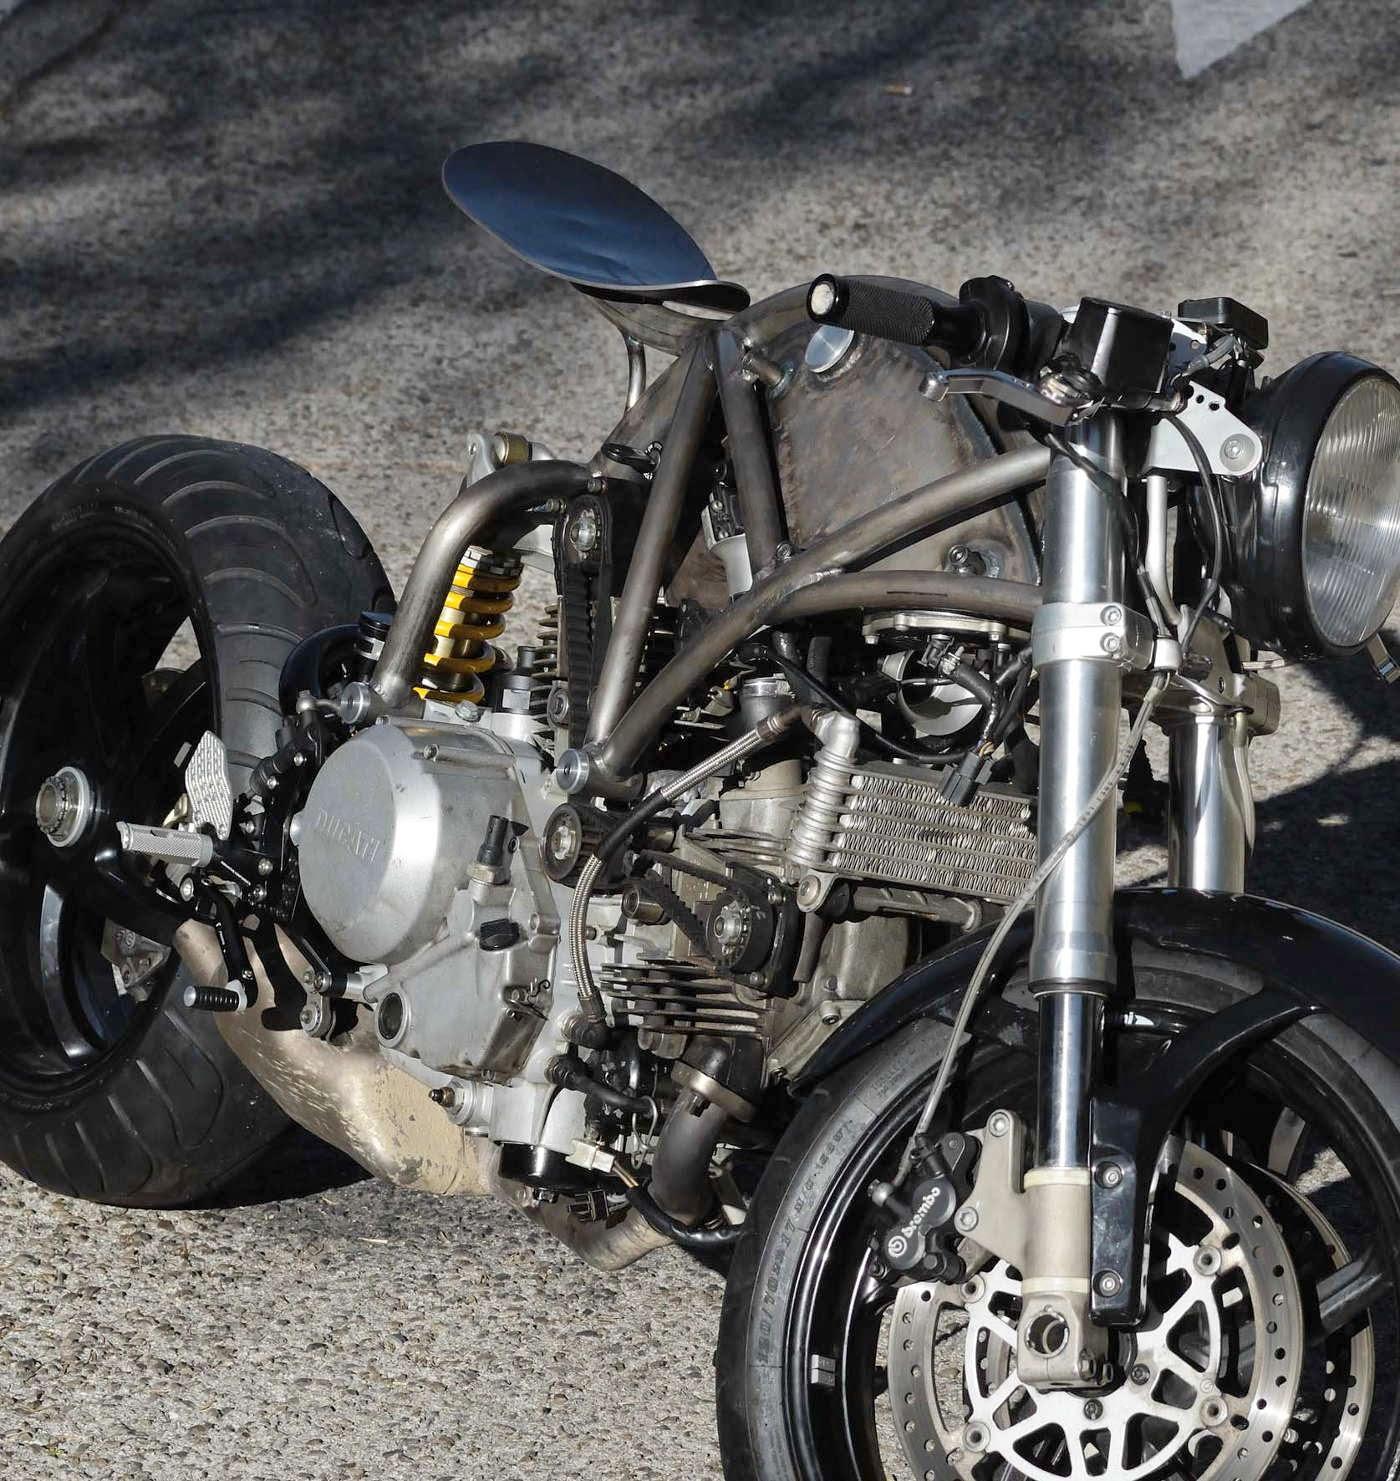 hight resolution of custom parts ducati monster custom parts ducati01pilosopiinfo 2001 yamaha r6 wiringdiagram